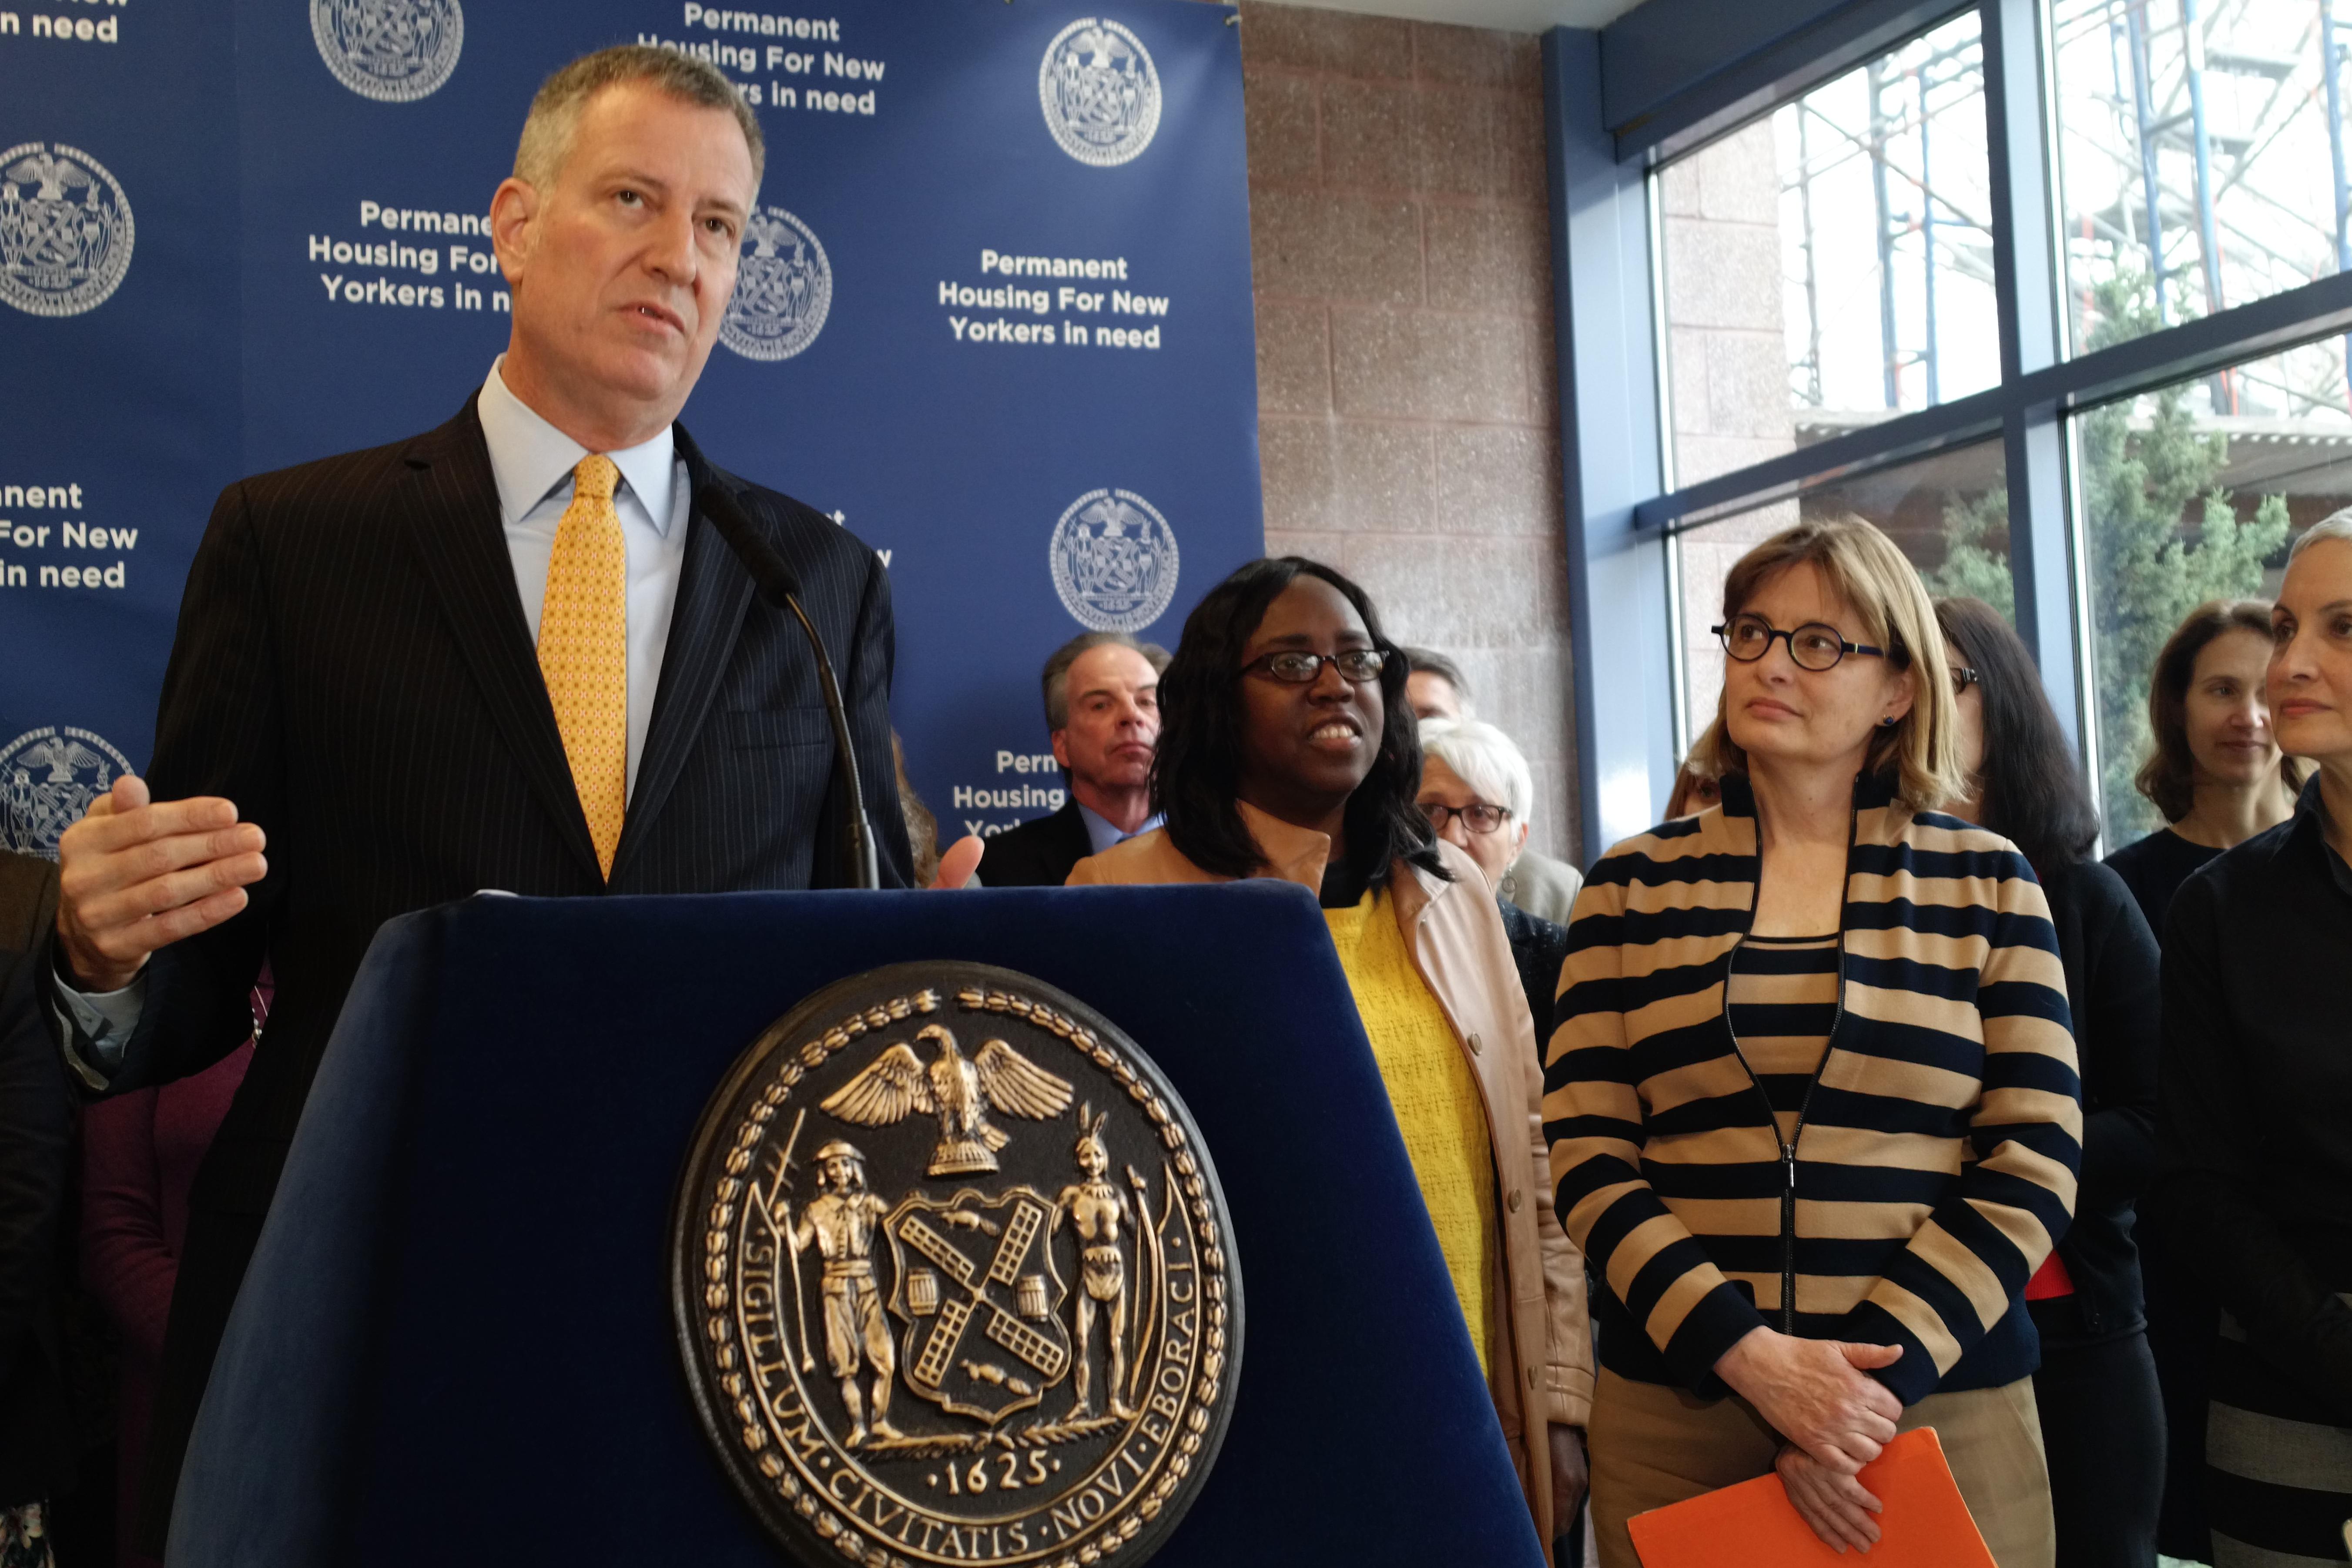 Mayor Bill de Blasio discusses supportive housing in Brooklyn. (Photo by Jillian Jorgensen for Observer)